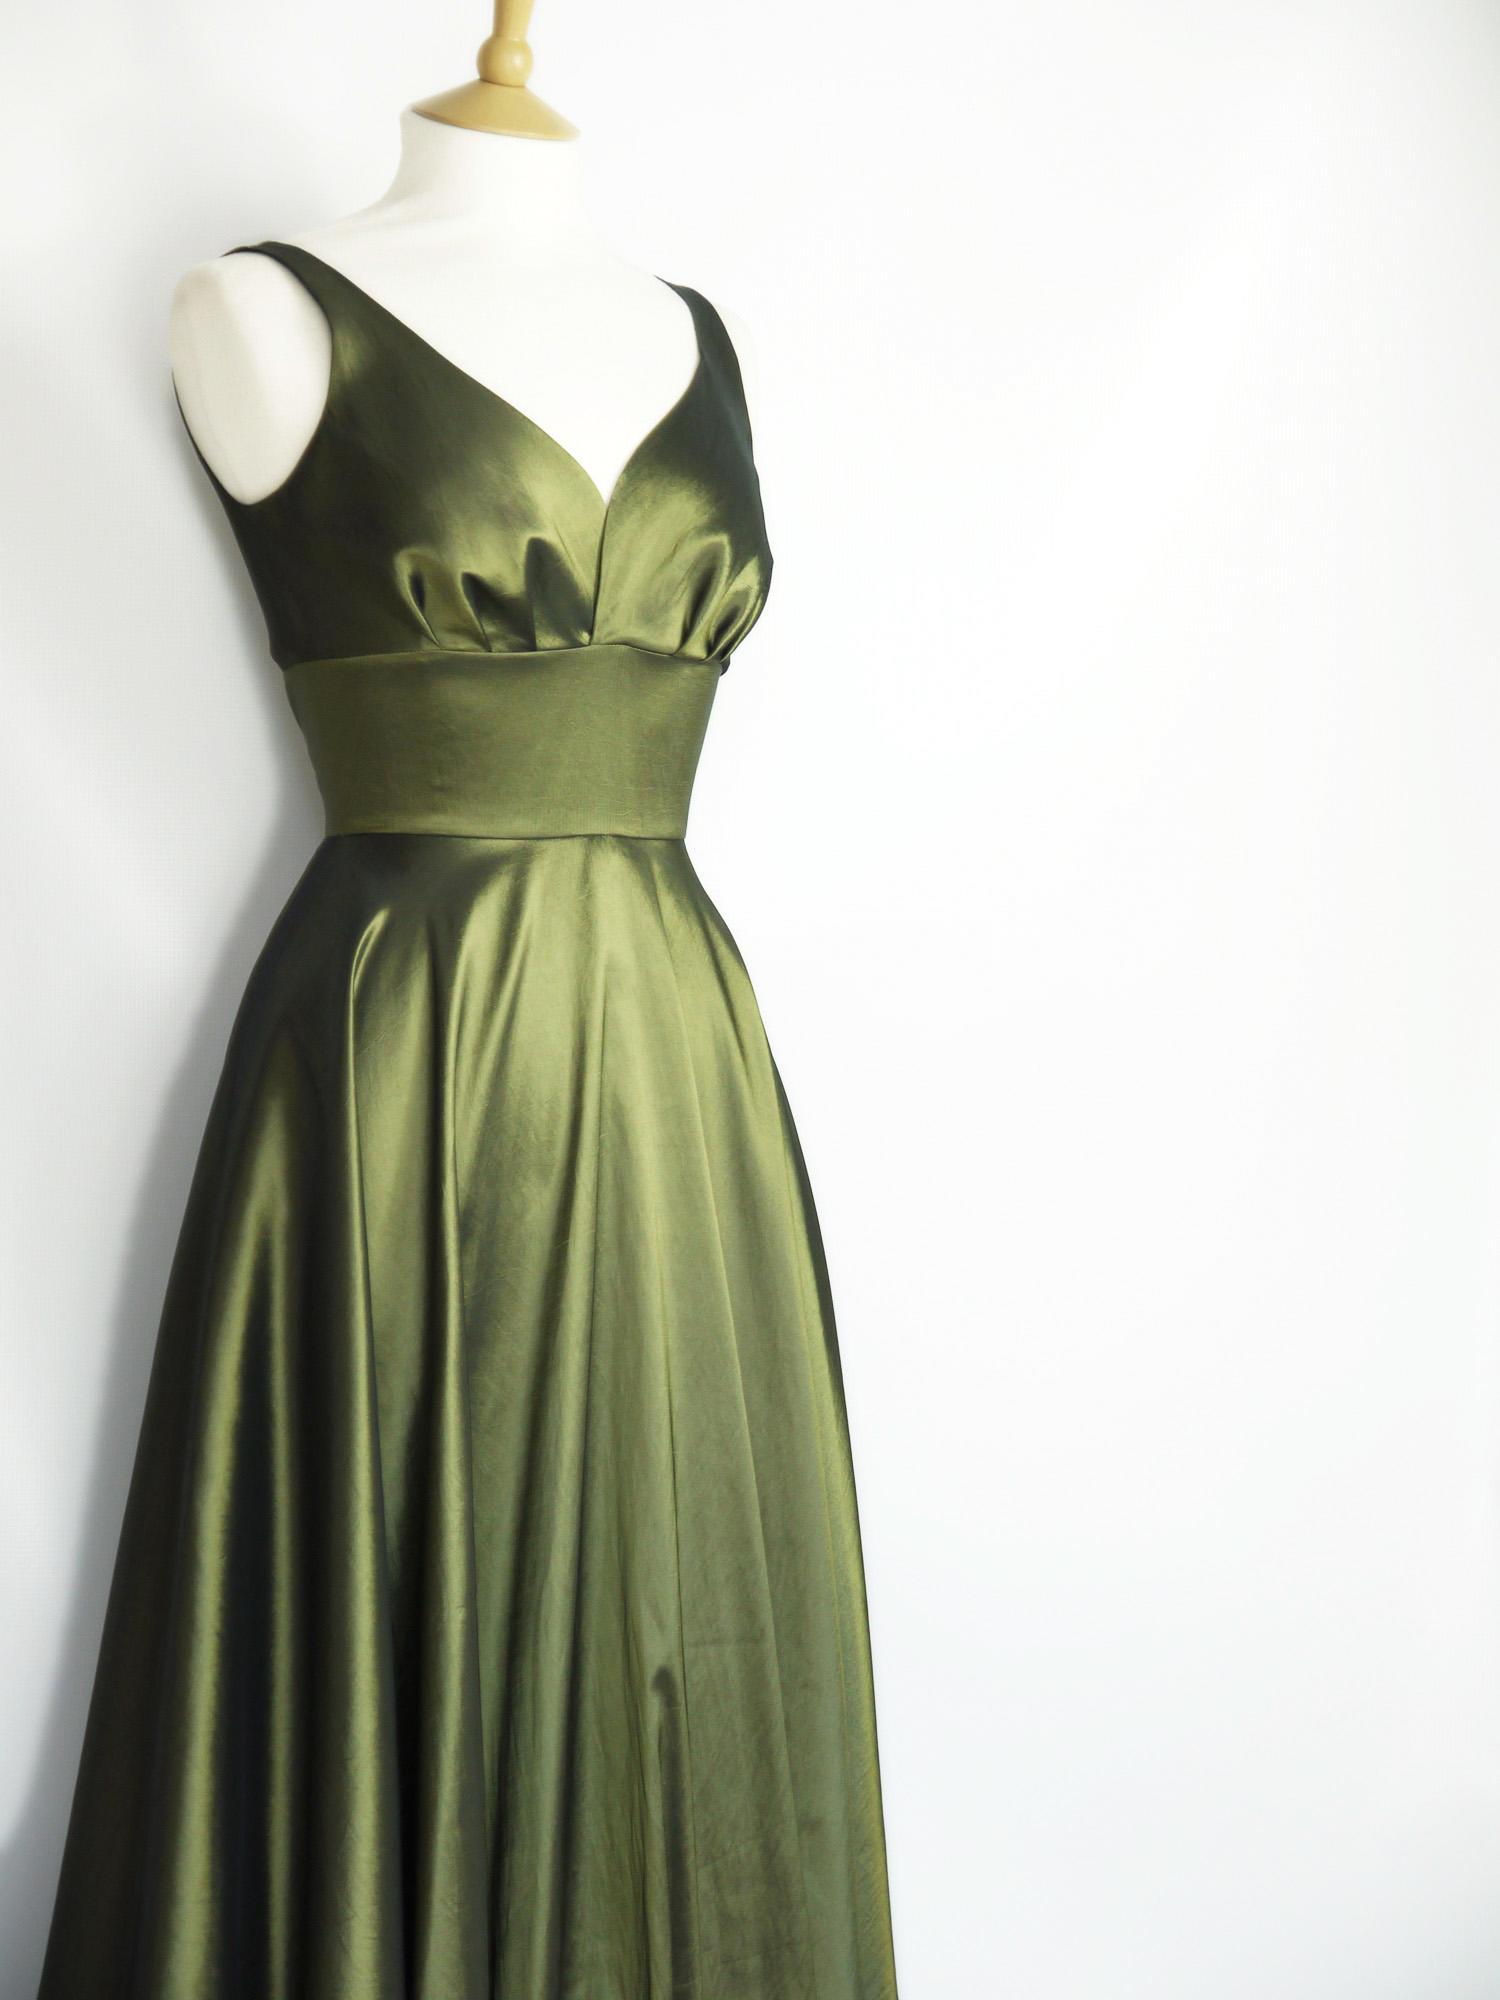 1940s Evening Dress,Beautiful Green Cocktail Dress,Olive Cocktail Dresses,Olive Dress,olive green dress,olive dress,olive green dress,